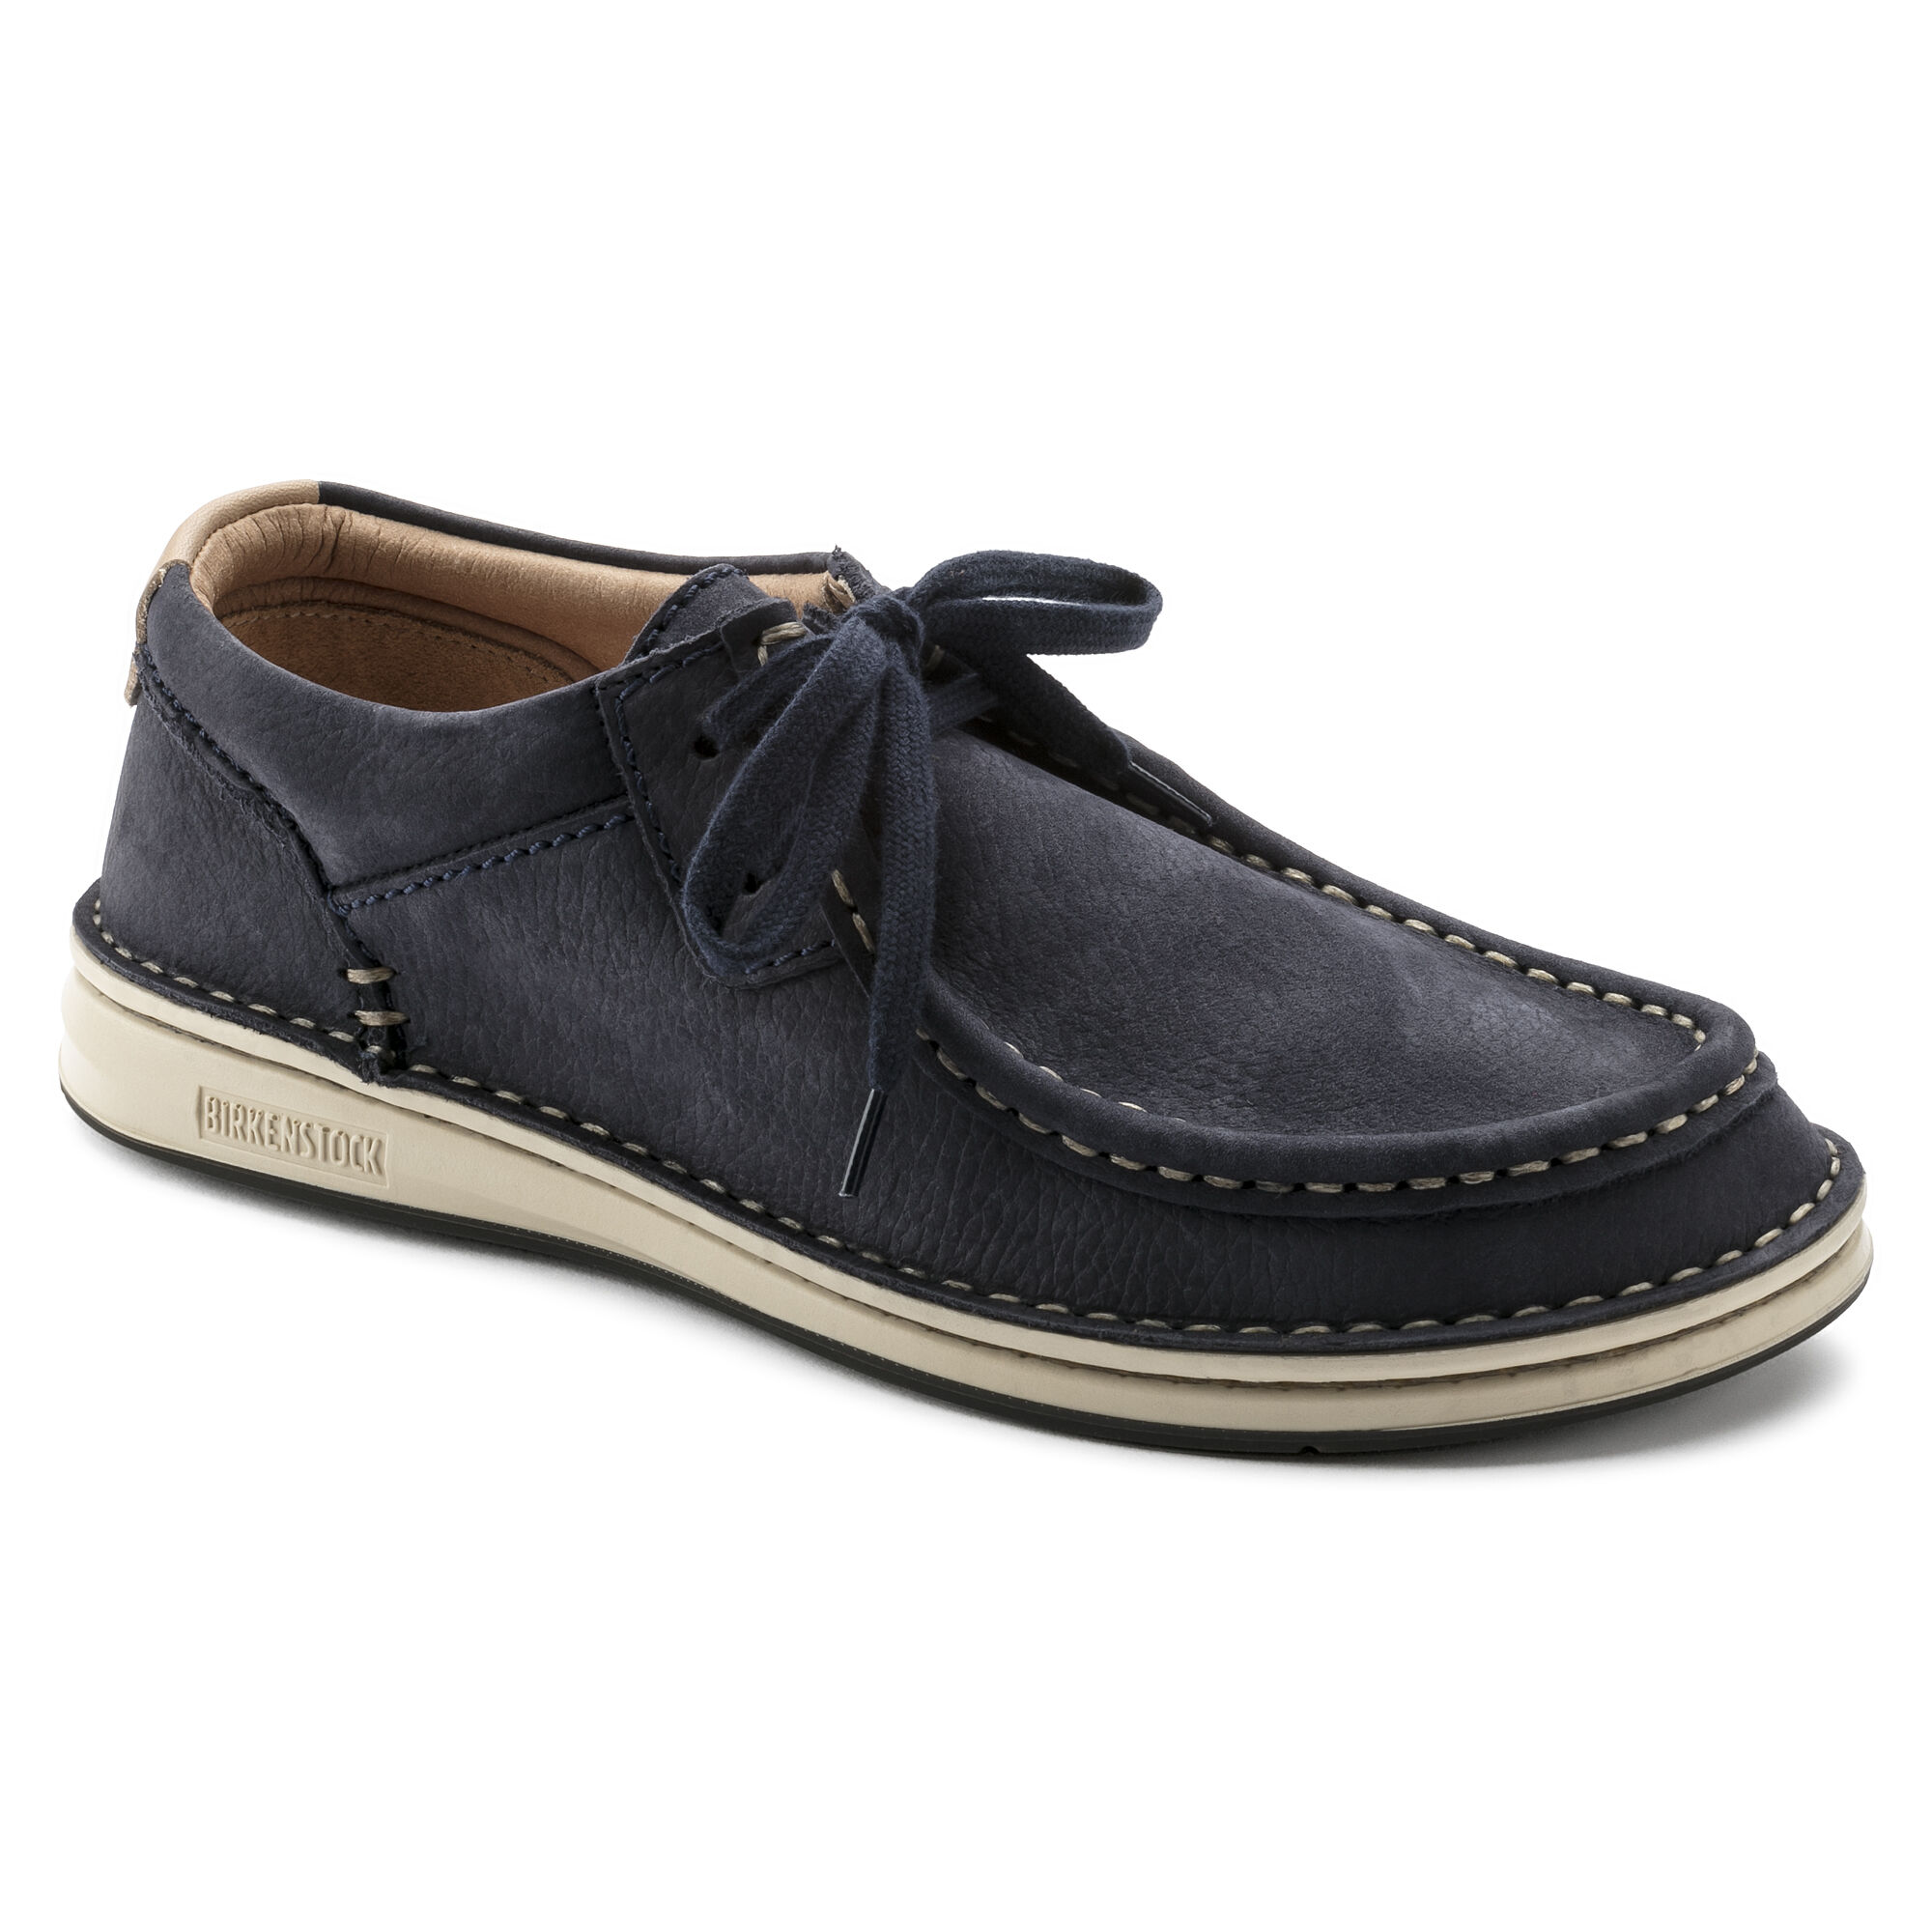 Birkenstock Madrid Zwart Goud Eagle Shoes  69f1f112eee